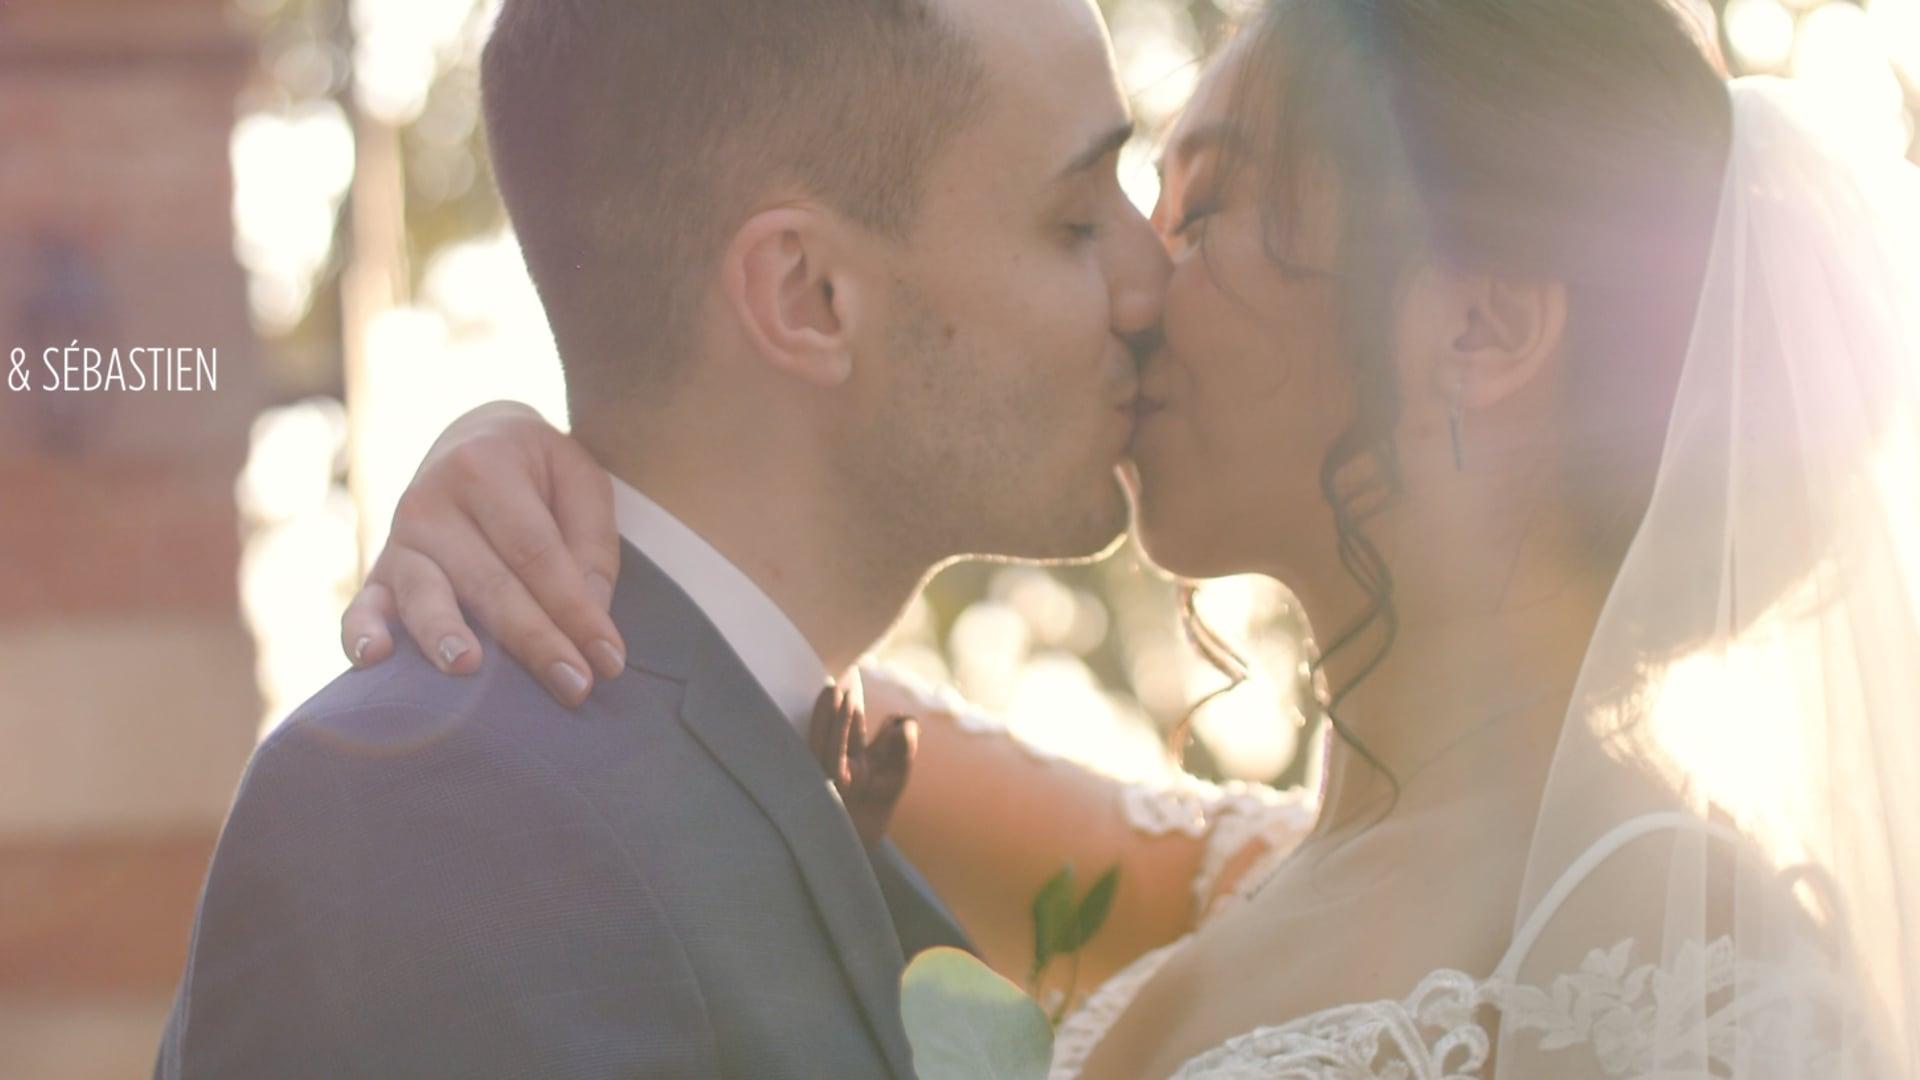 Film mariage Anne et Sébastien